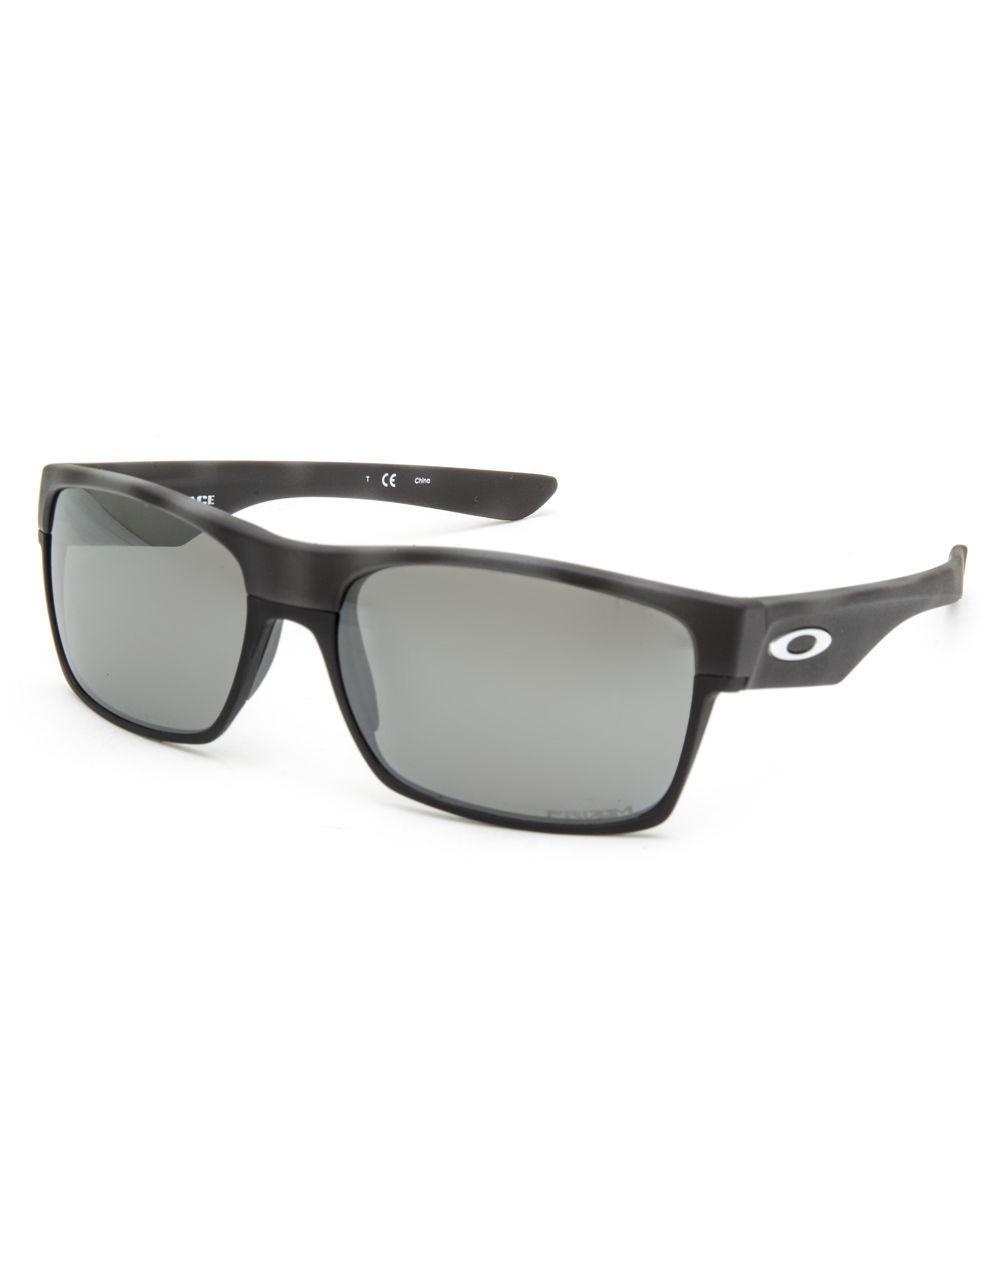 475f206f06 Lyst - Oakley Twoface Black Camo   Prizm Black Polarized Sunglasses ...